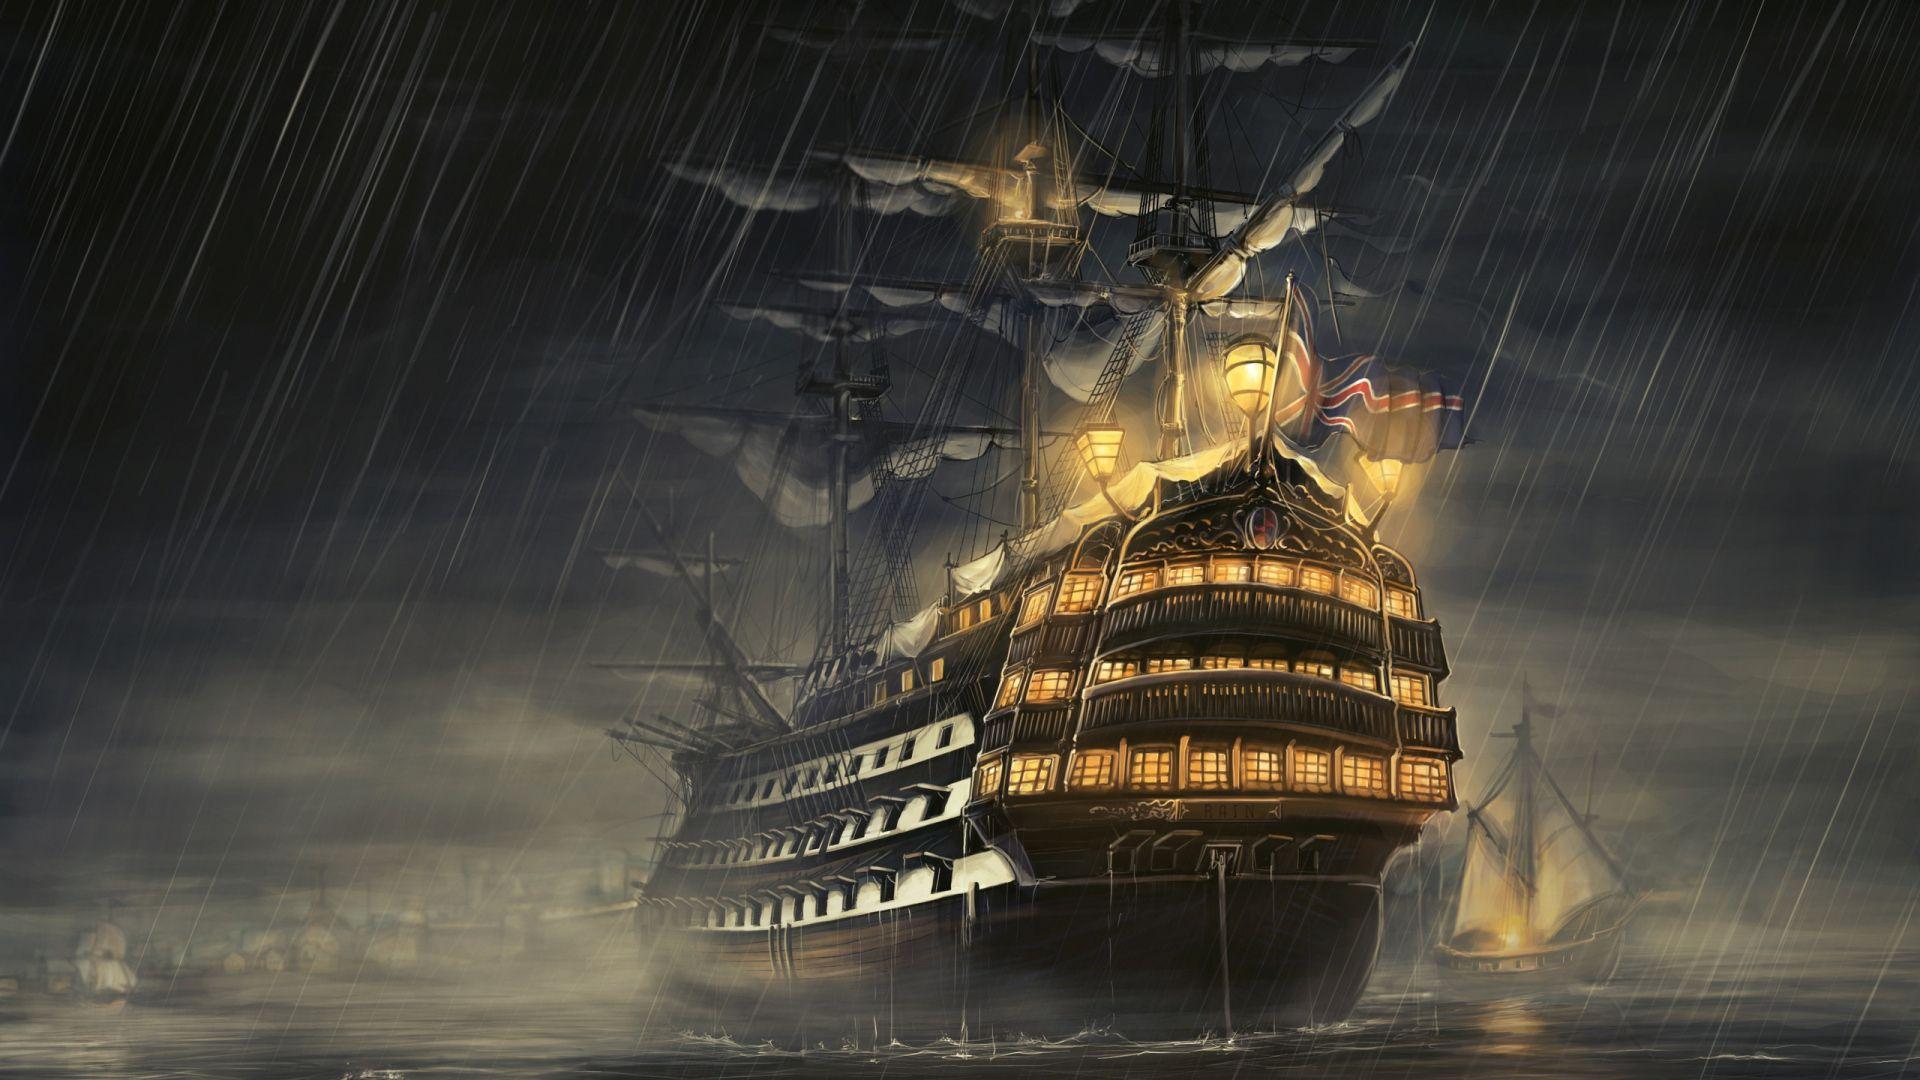 Download Wallpaper 1920x1080 Ships Sea Light Rain Full HD 1080p 1920x1080